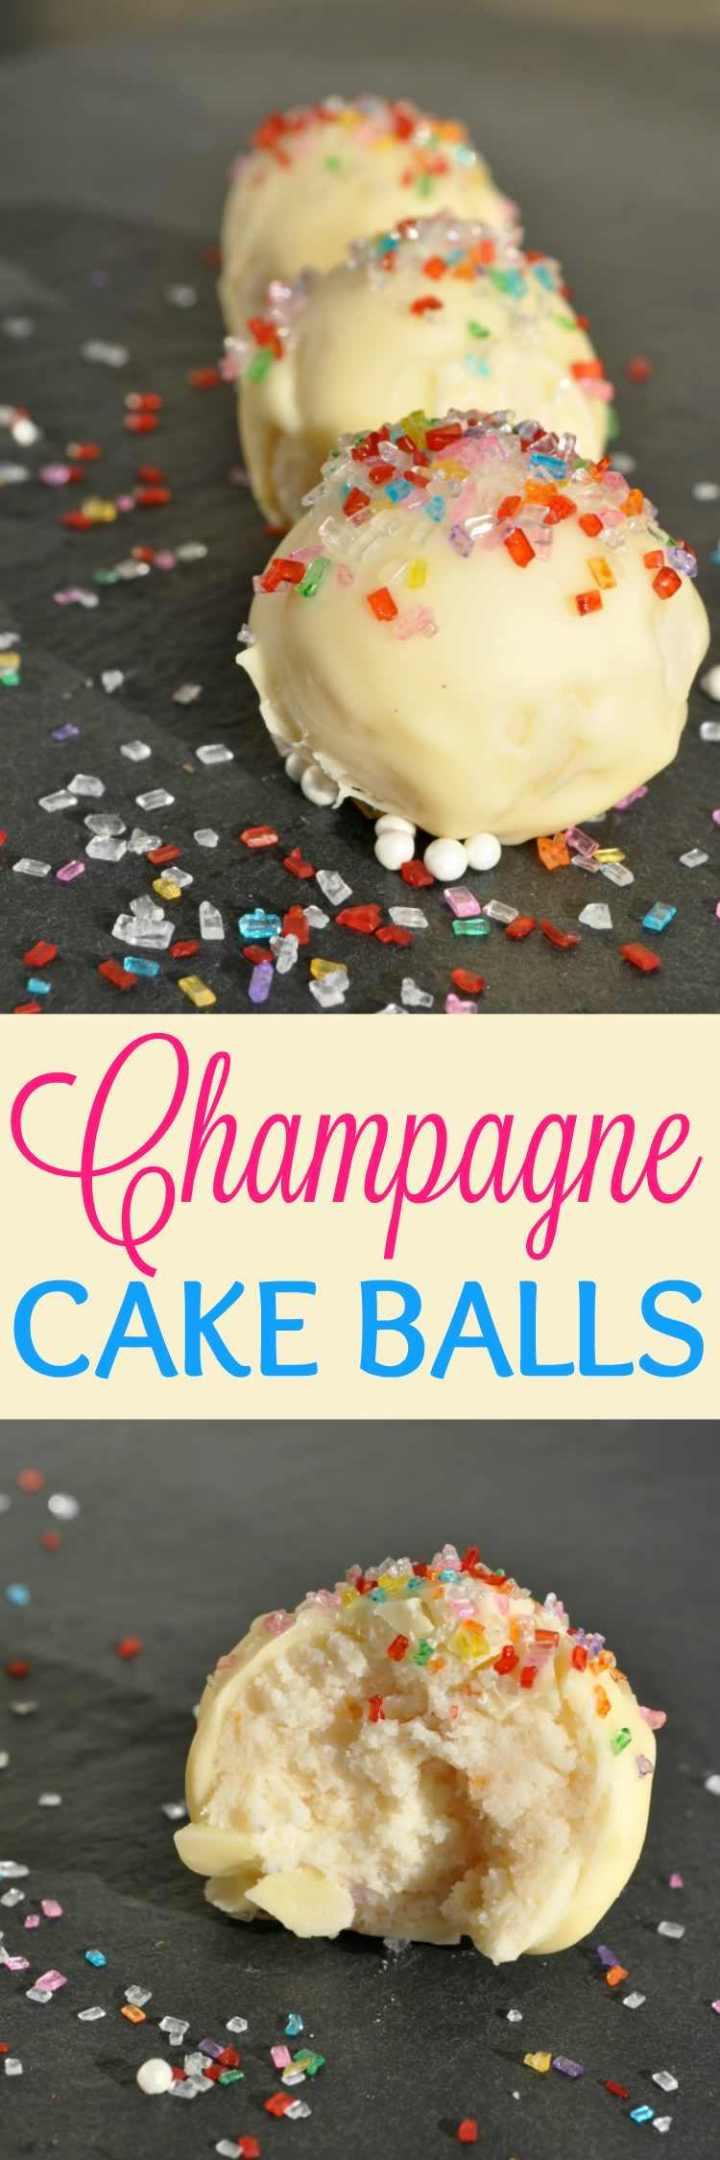 champagne-cake-balls1